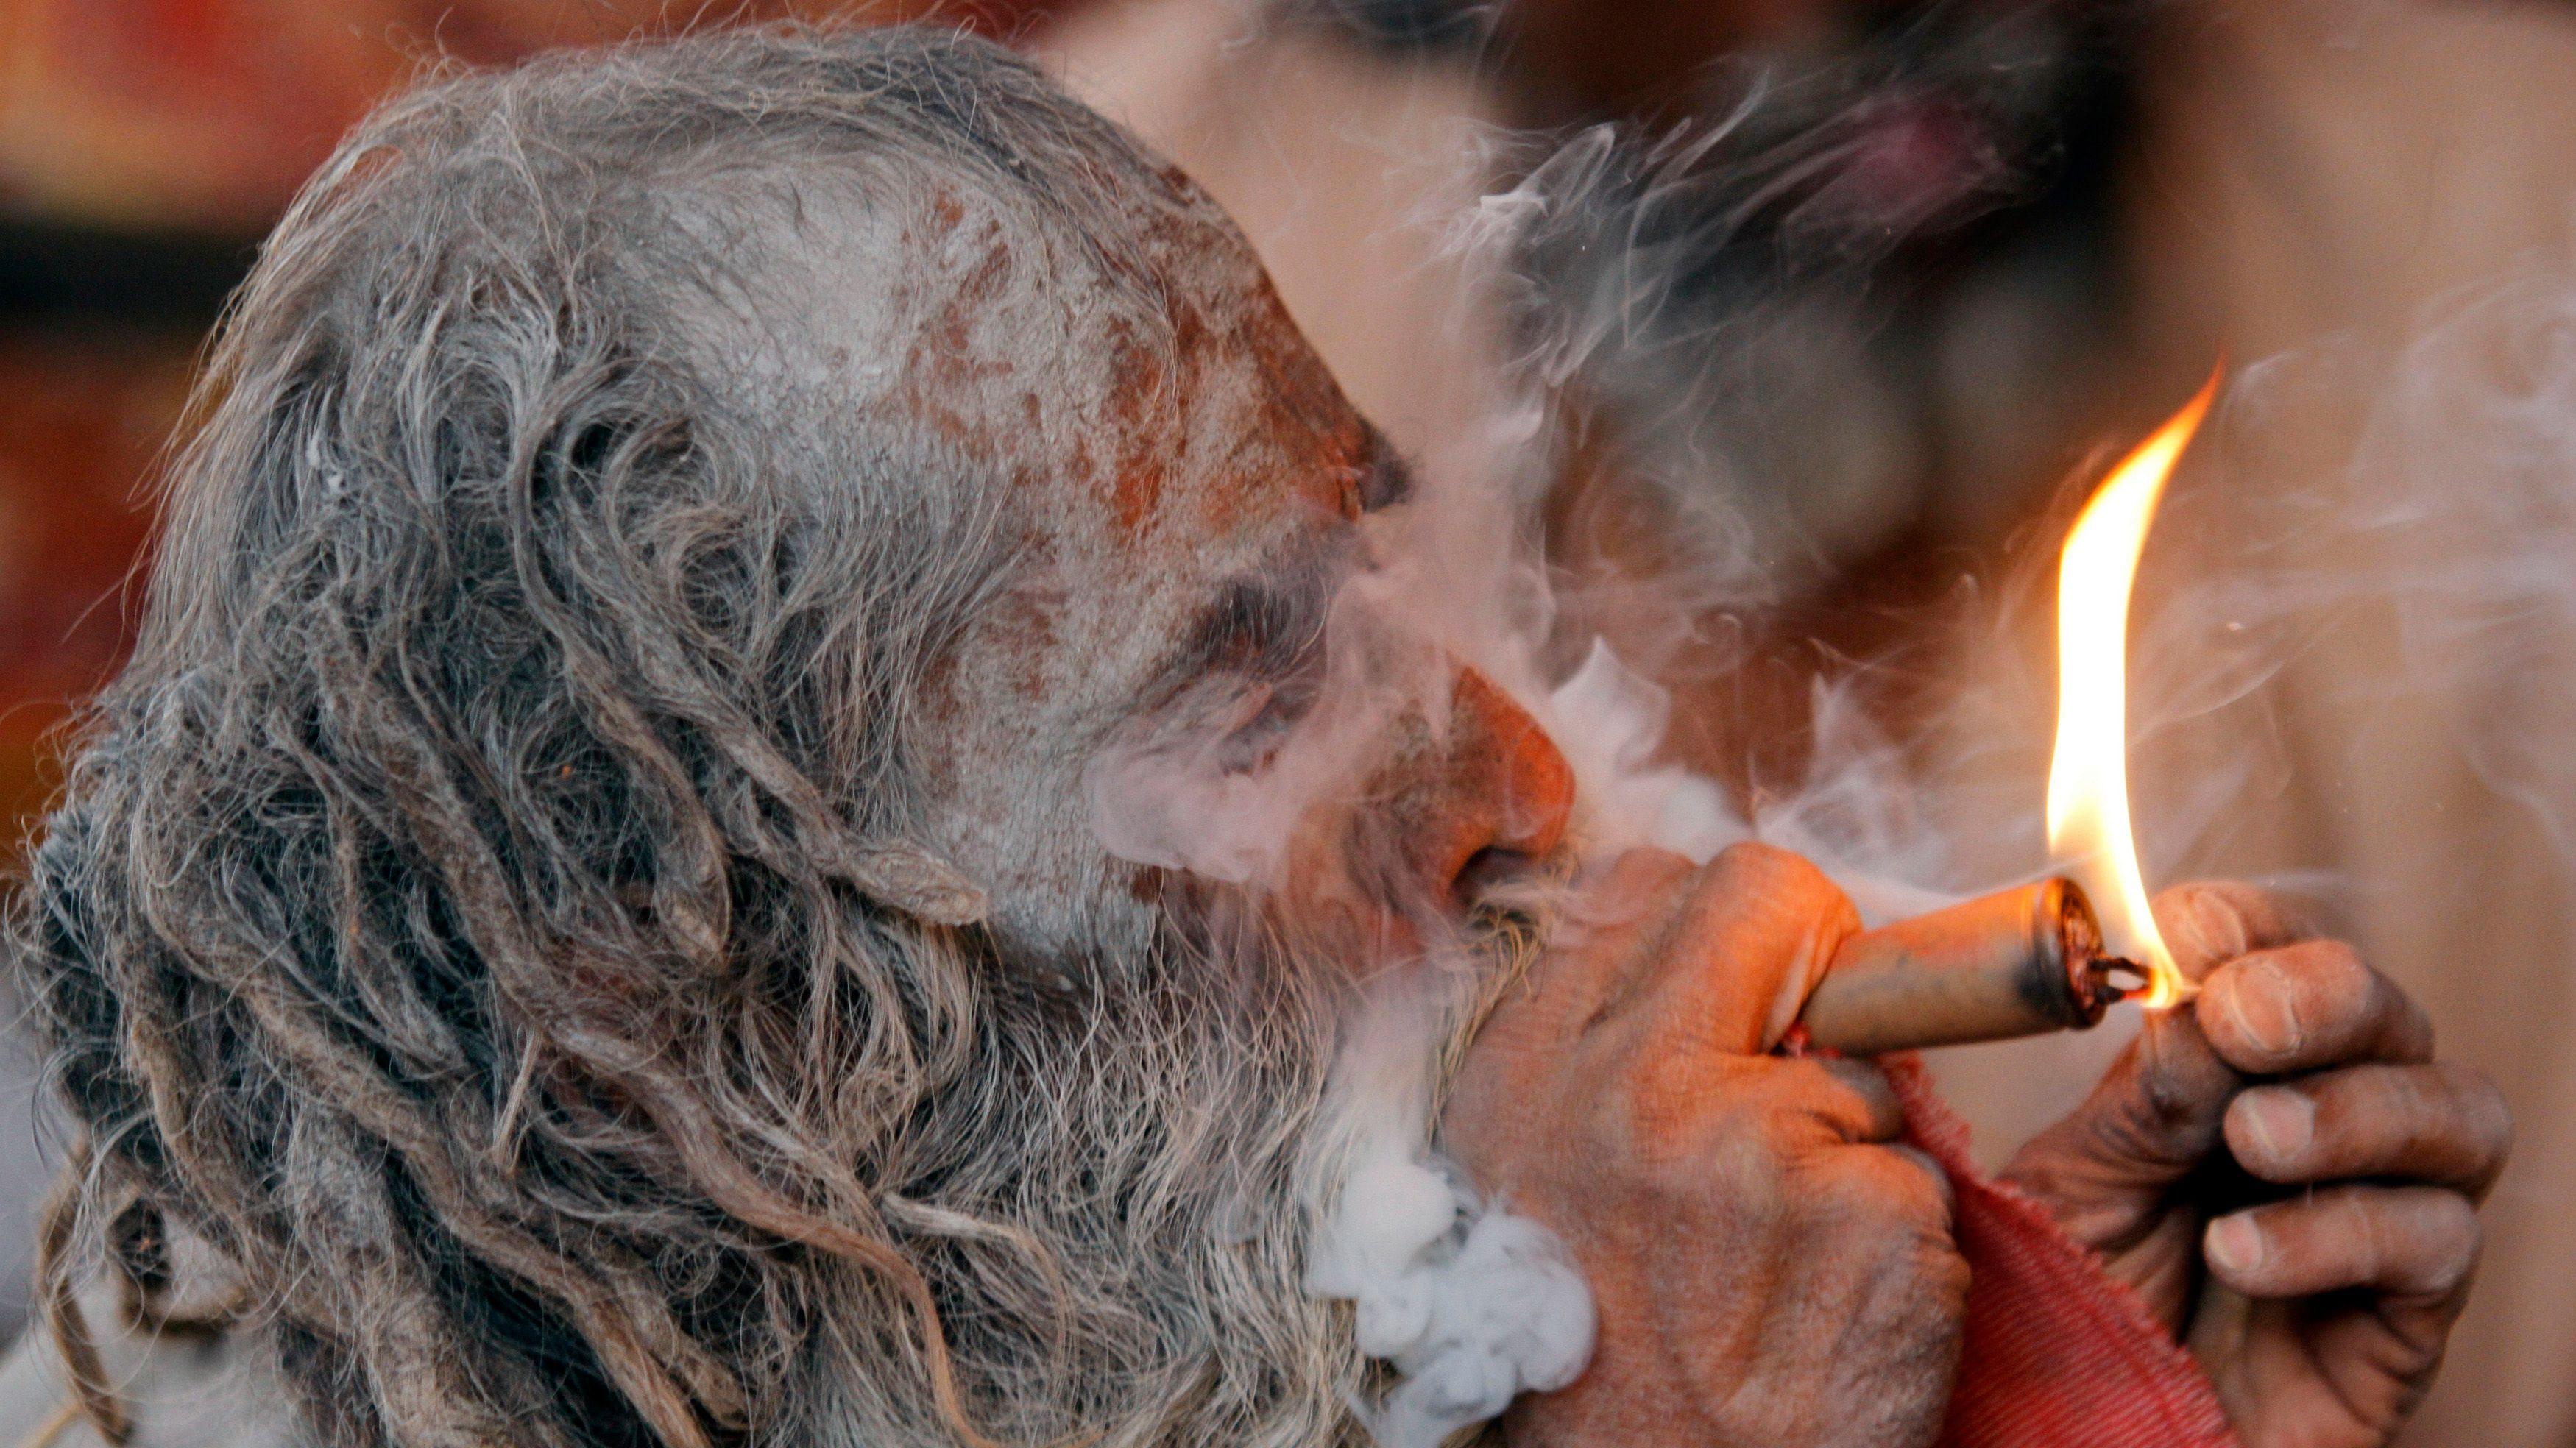 Modi's love for ayurveda may be just the push marijuana needed in India